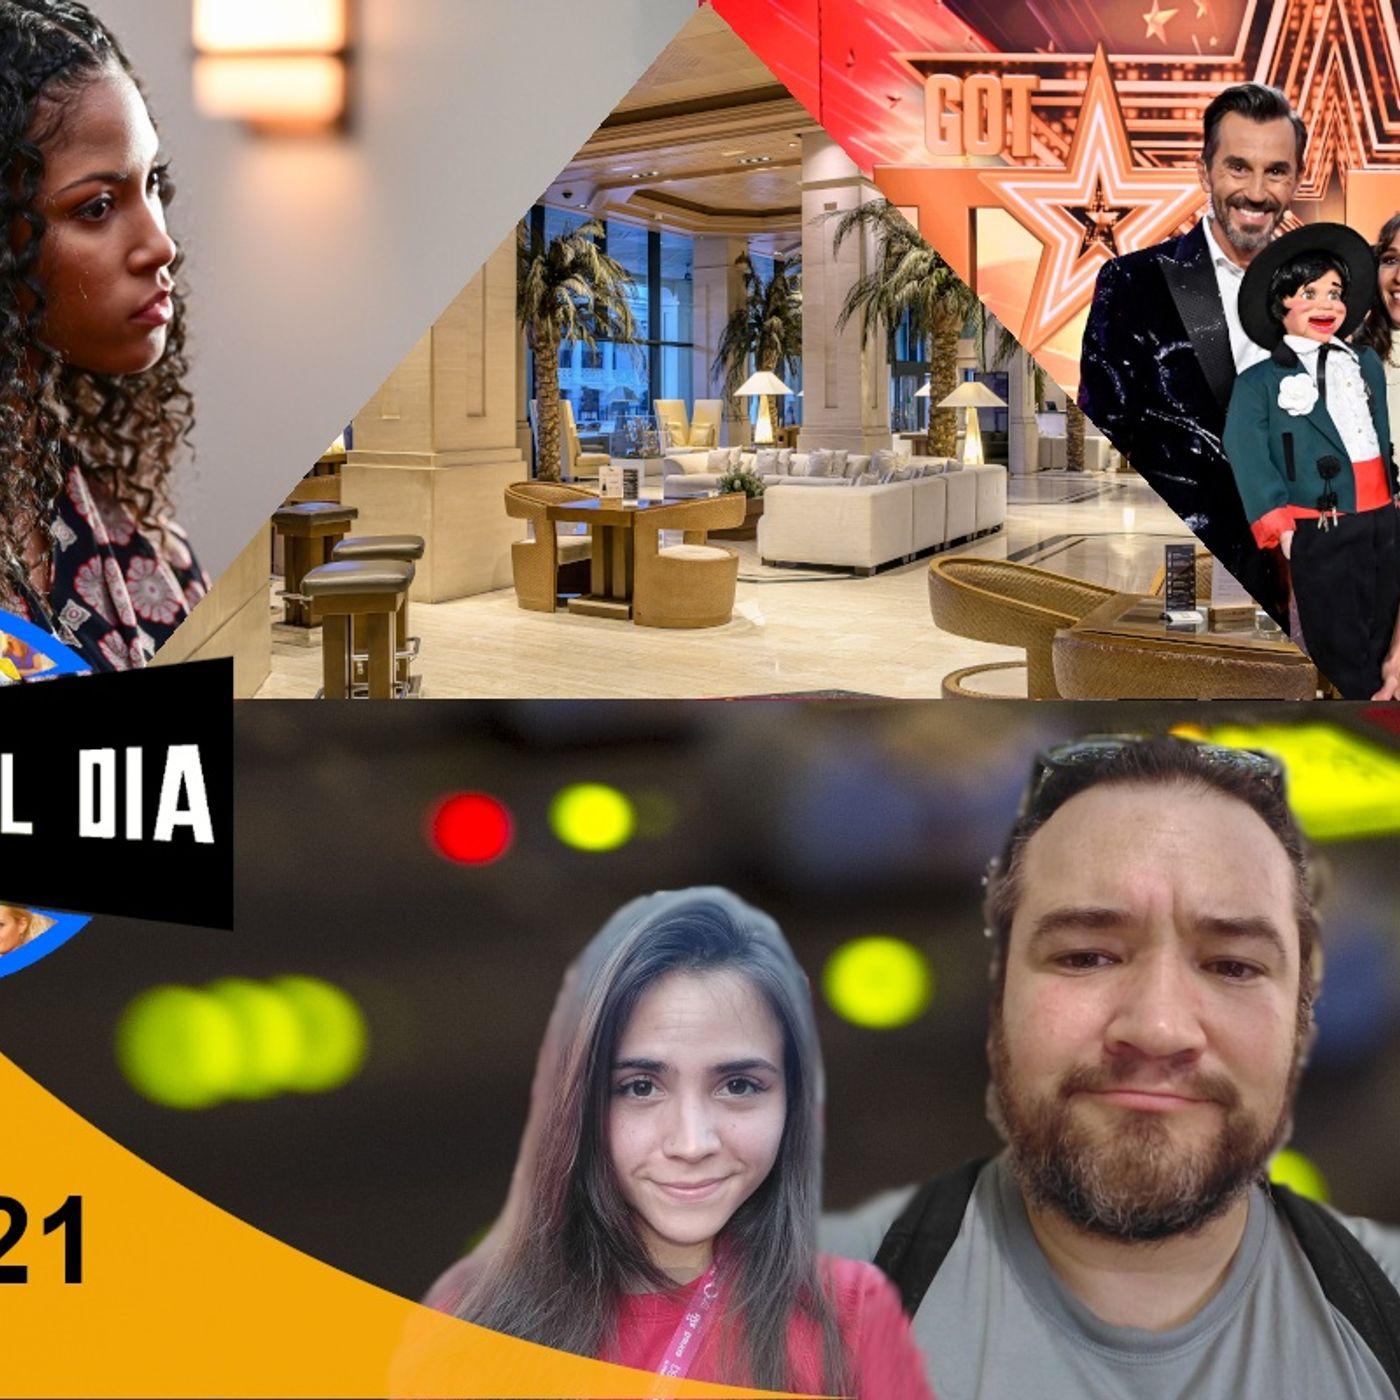 Got Talent | Marvel Studios | Ponte al día 441 (03/05/21)